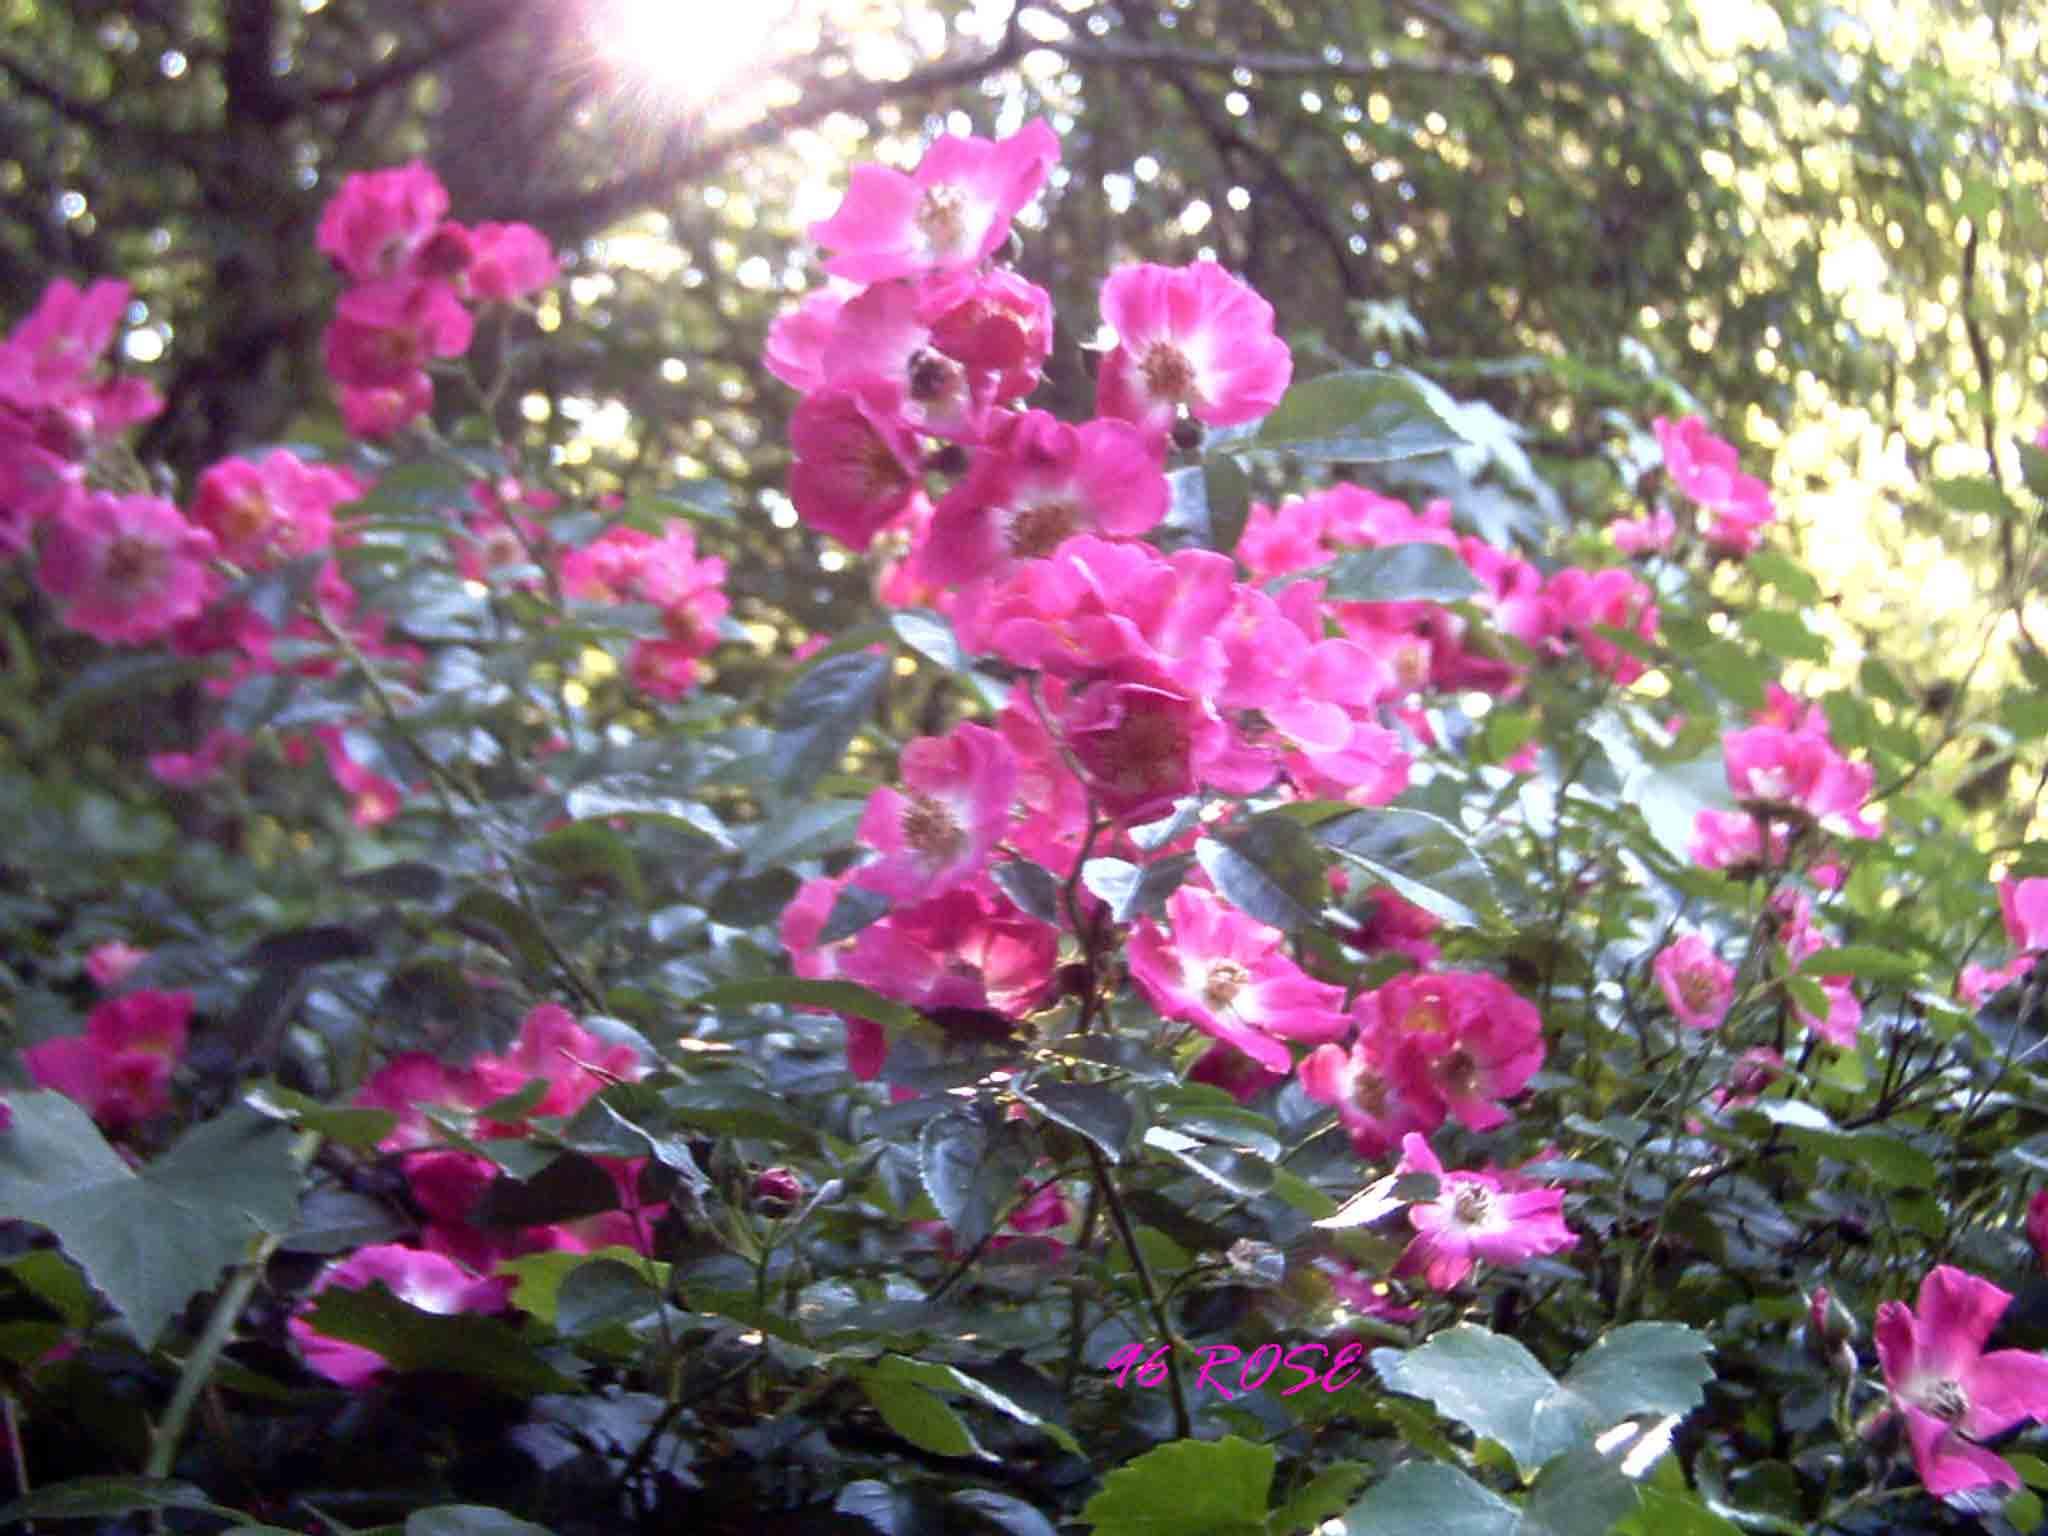 96 rose in bloom